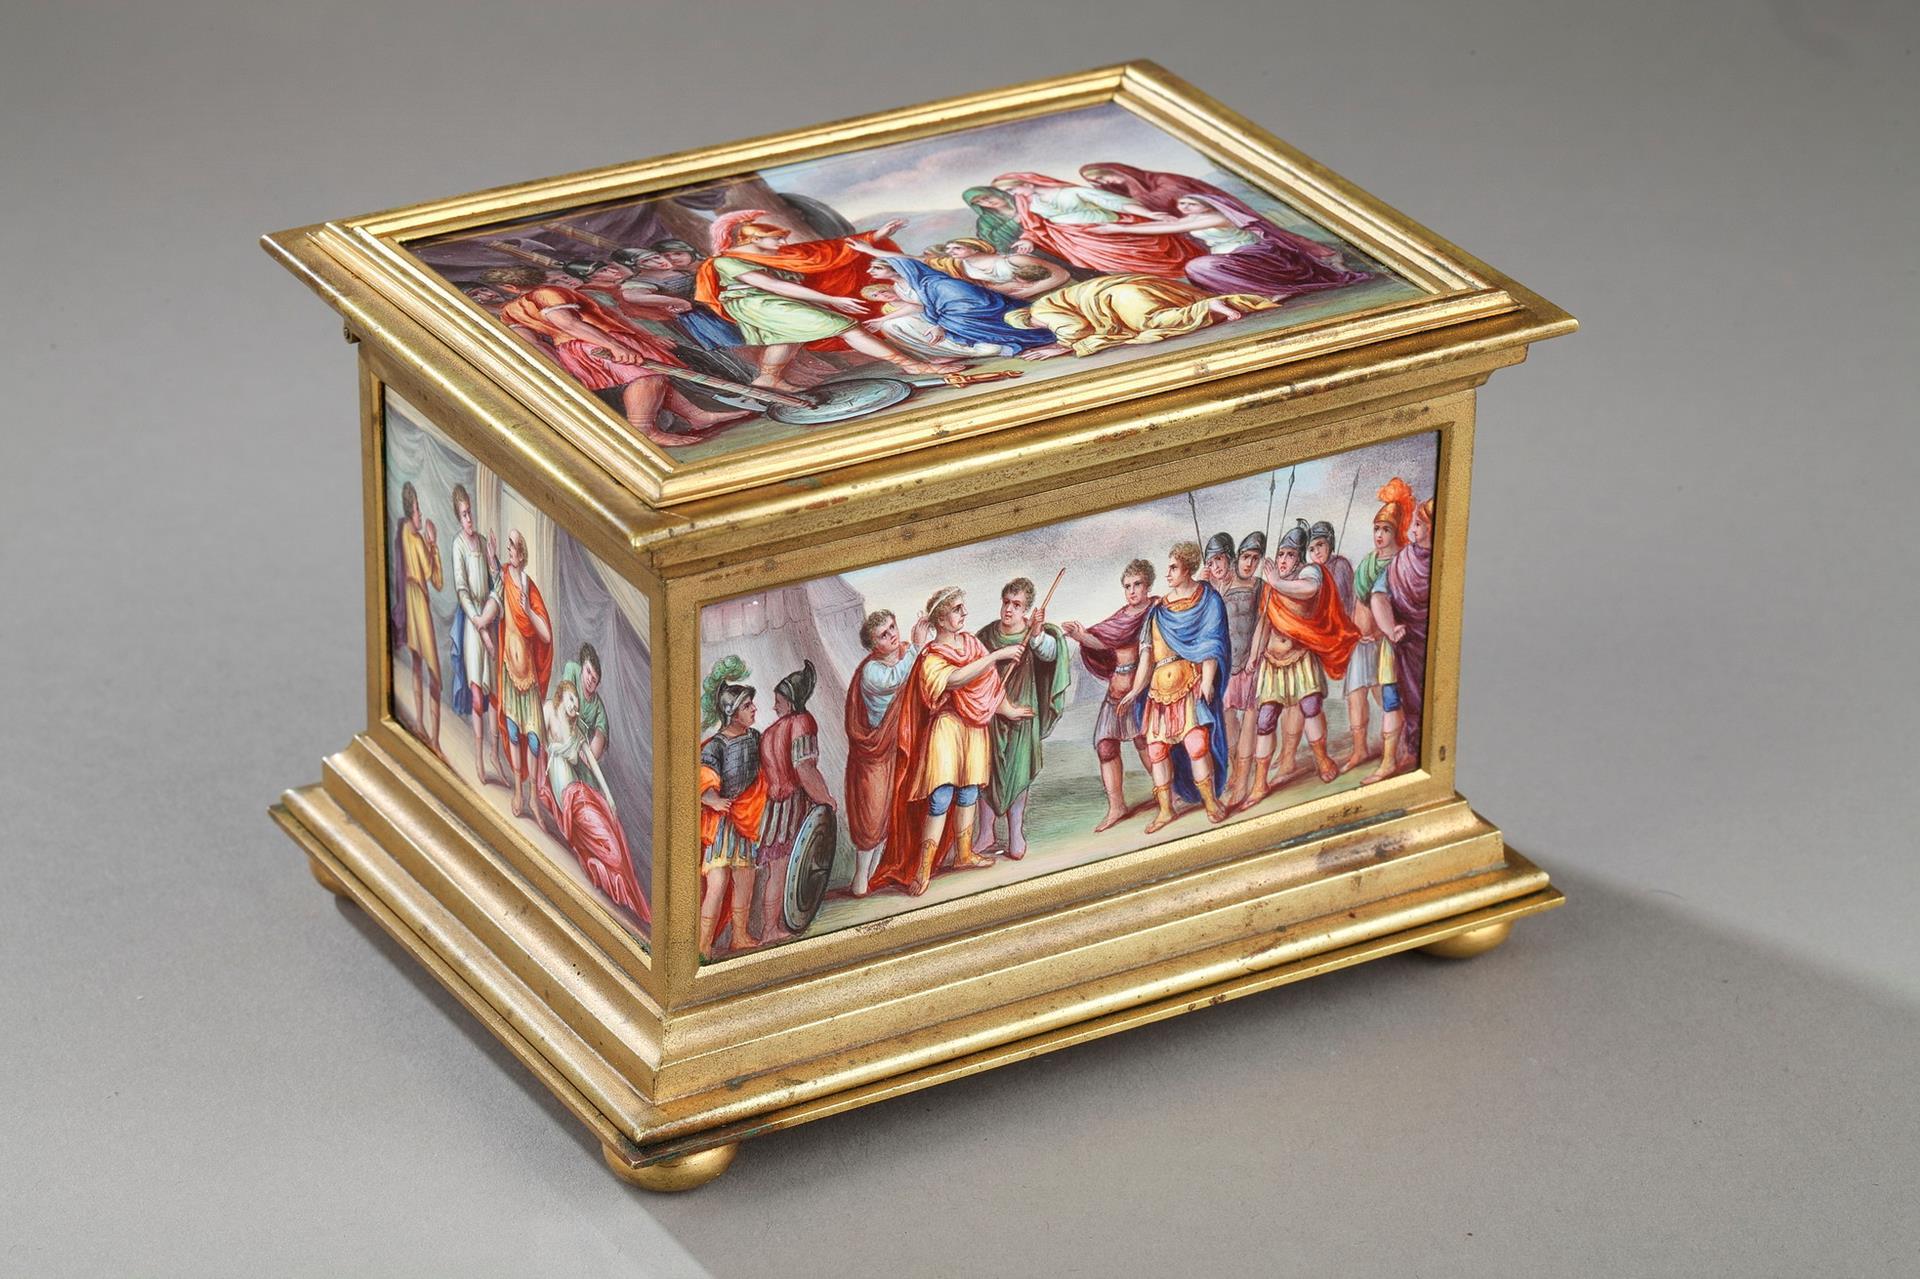 ENAMEL BOX WITH MYTHOLOGICAL SCENES. VIENNA 19TH CENTURY.